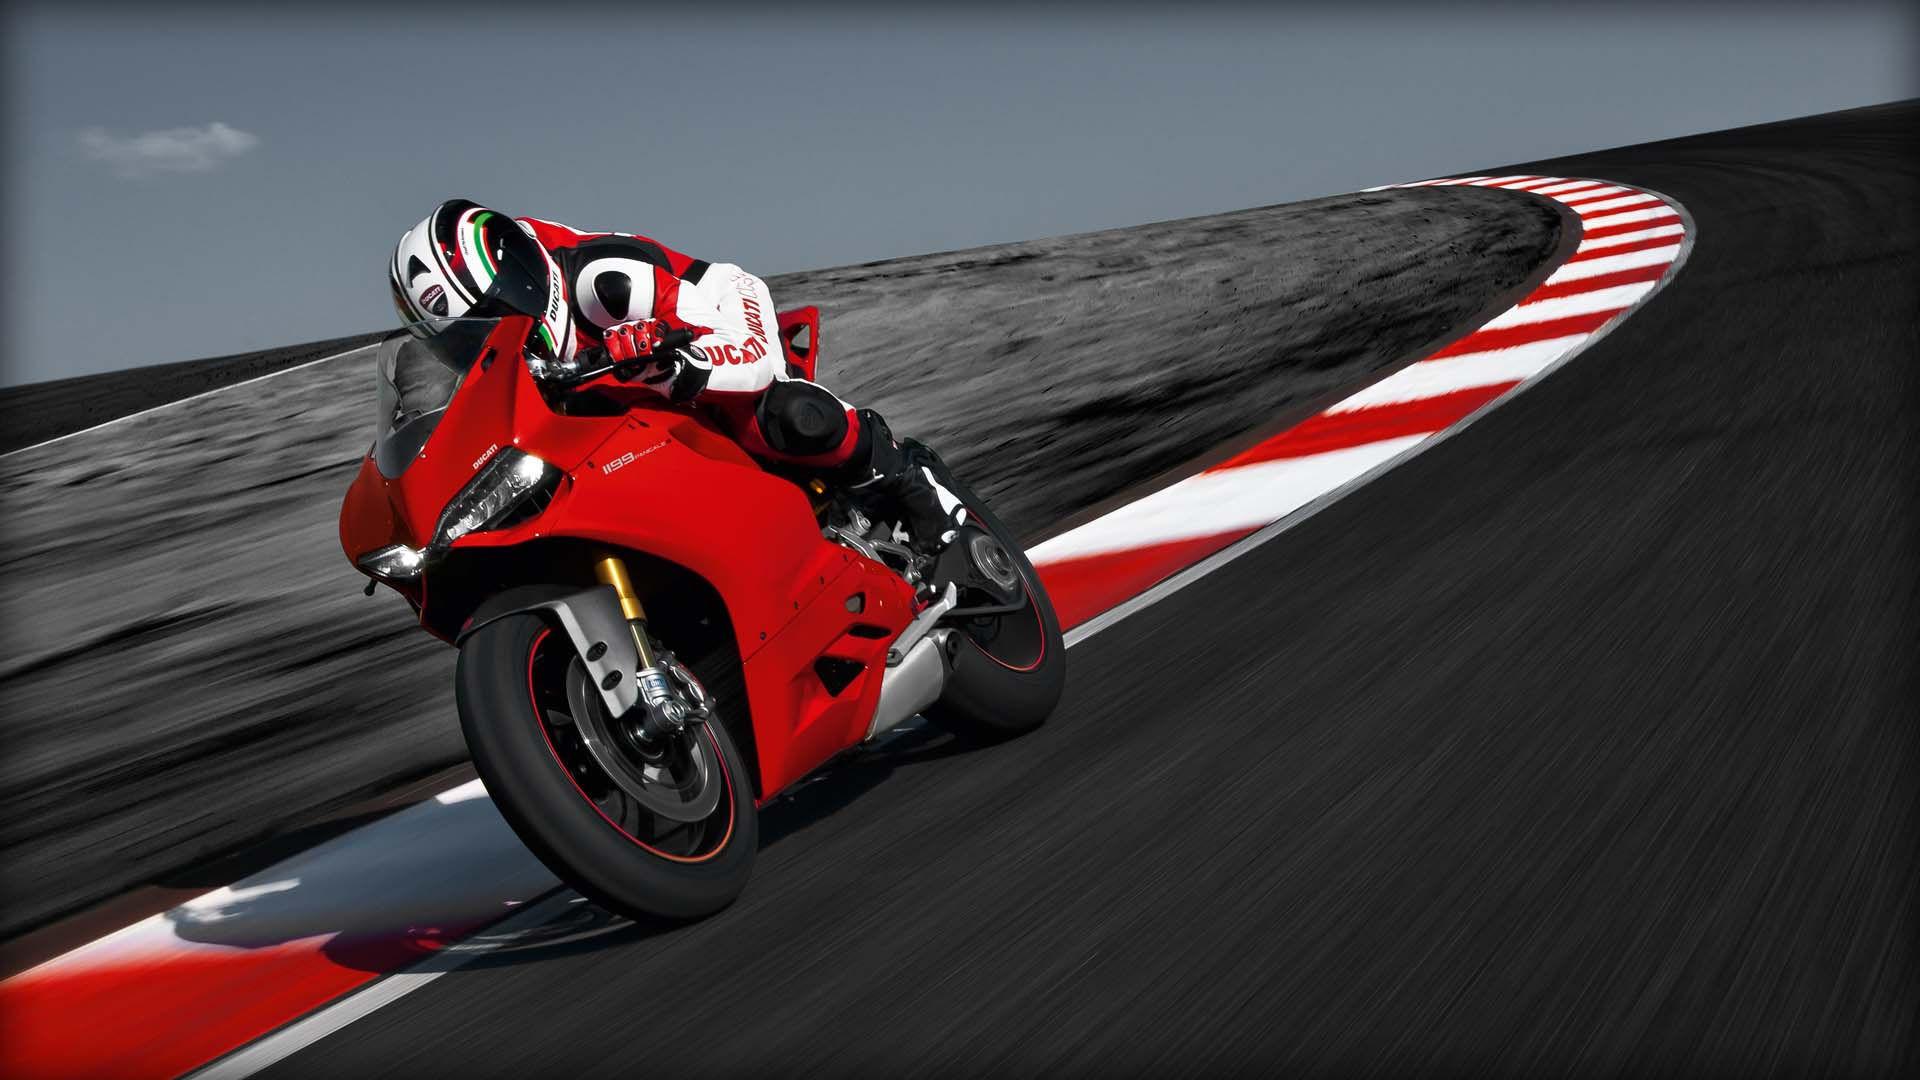 2014 Ducati 1199 PANIGALE S | Ducati 1199 Panigale S - Track